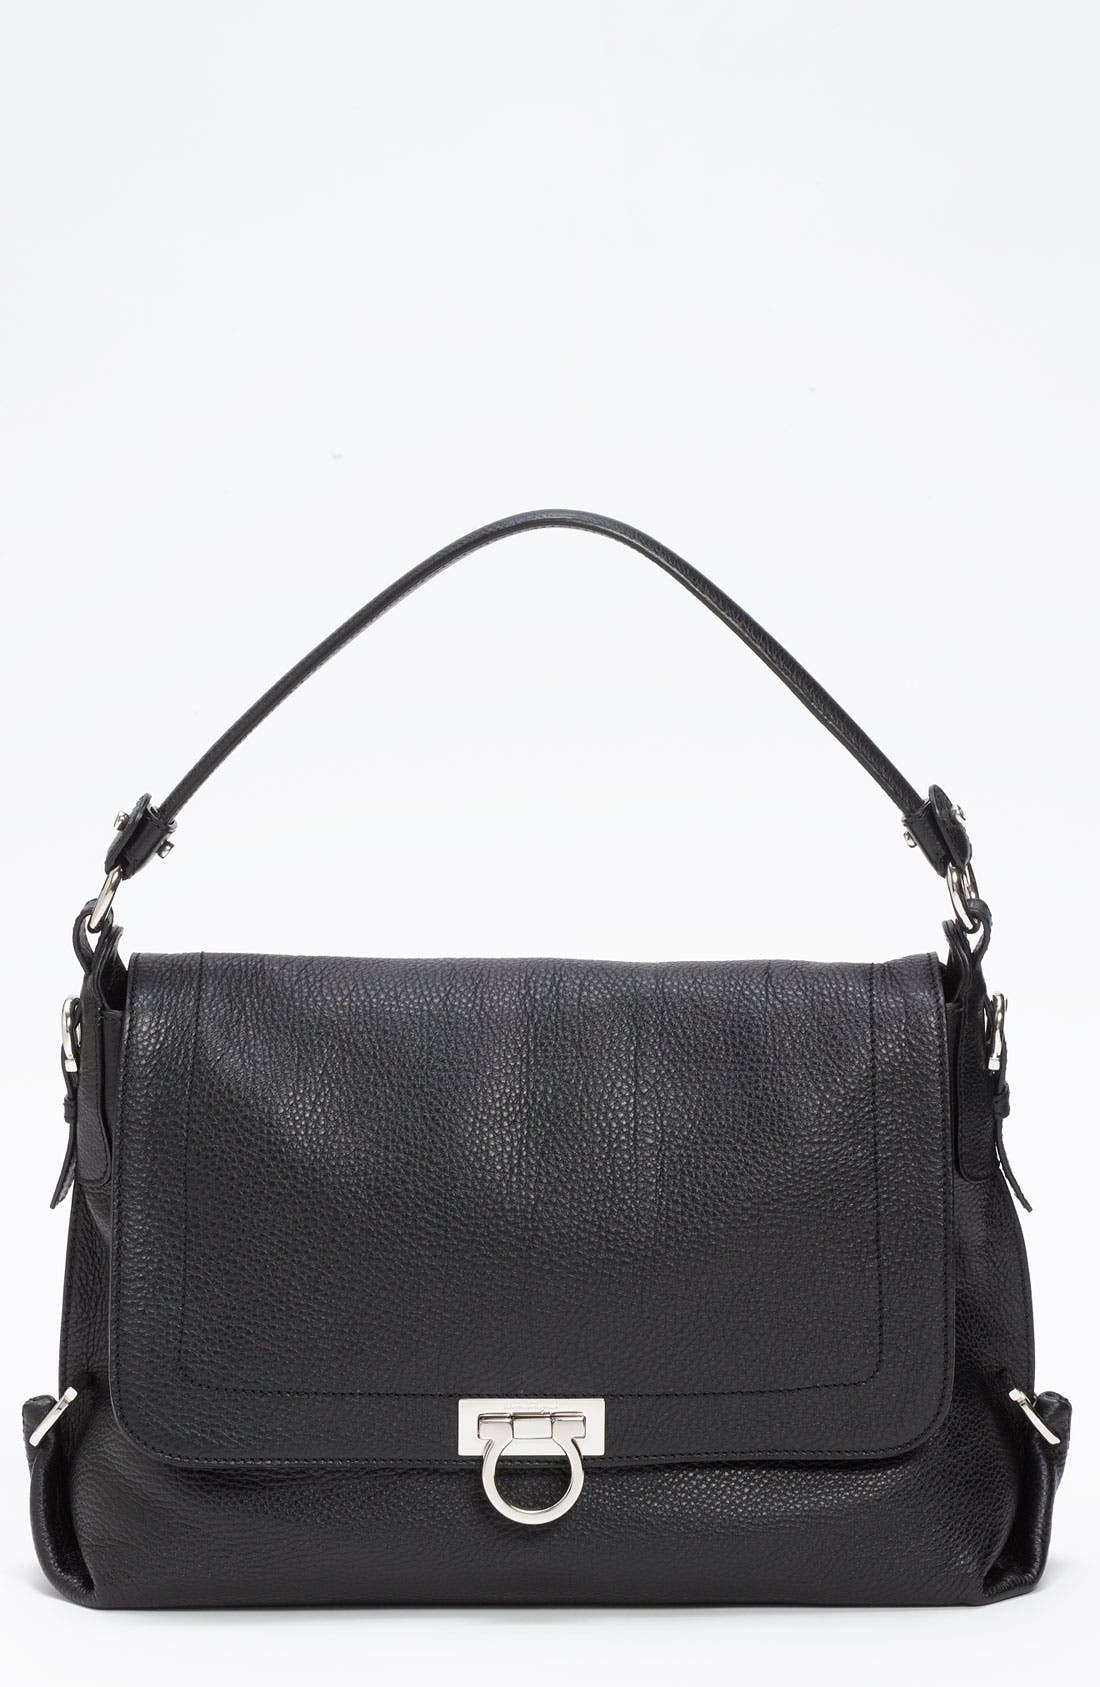 Main Image - Salvatore Ferragamo 'Avye' Leather Shoulder Bag